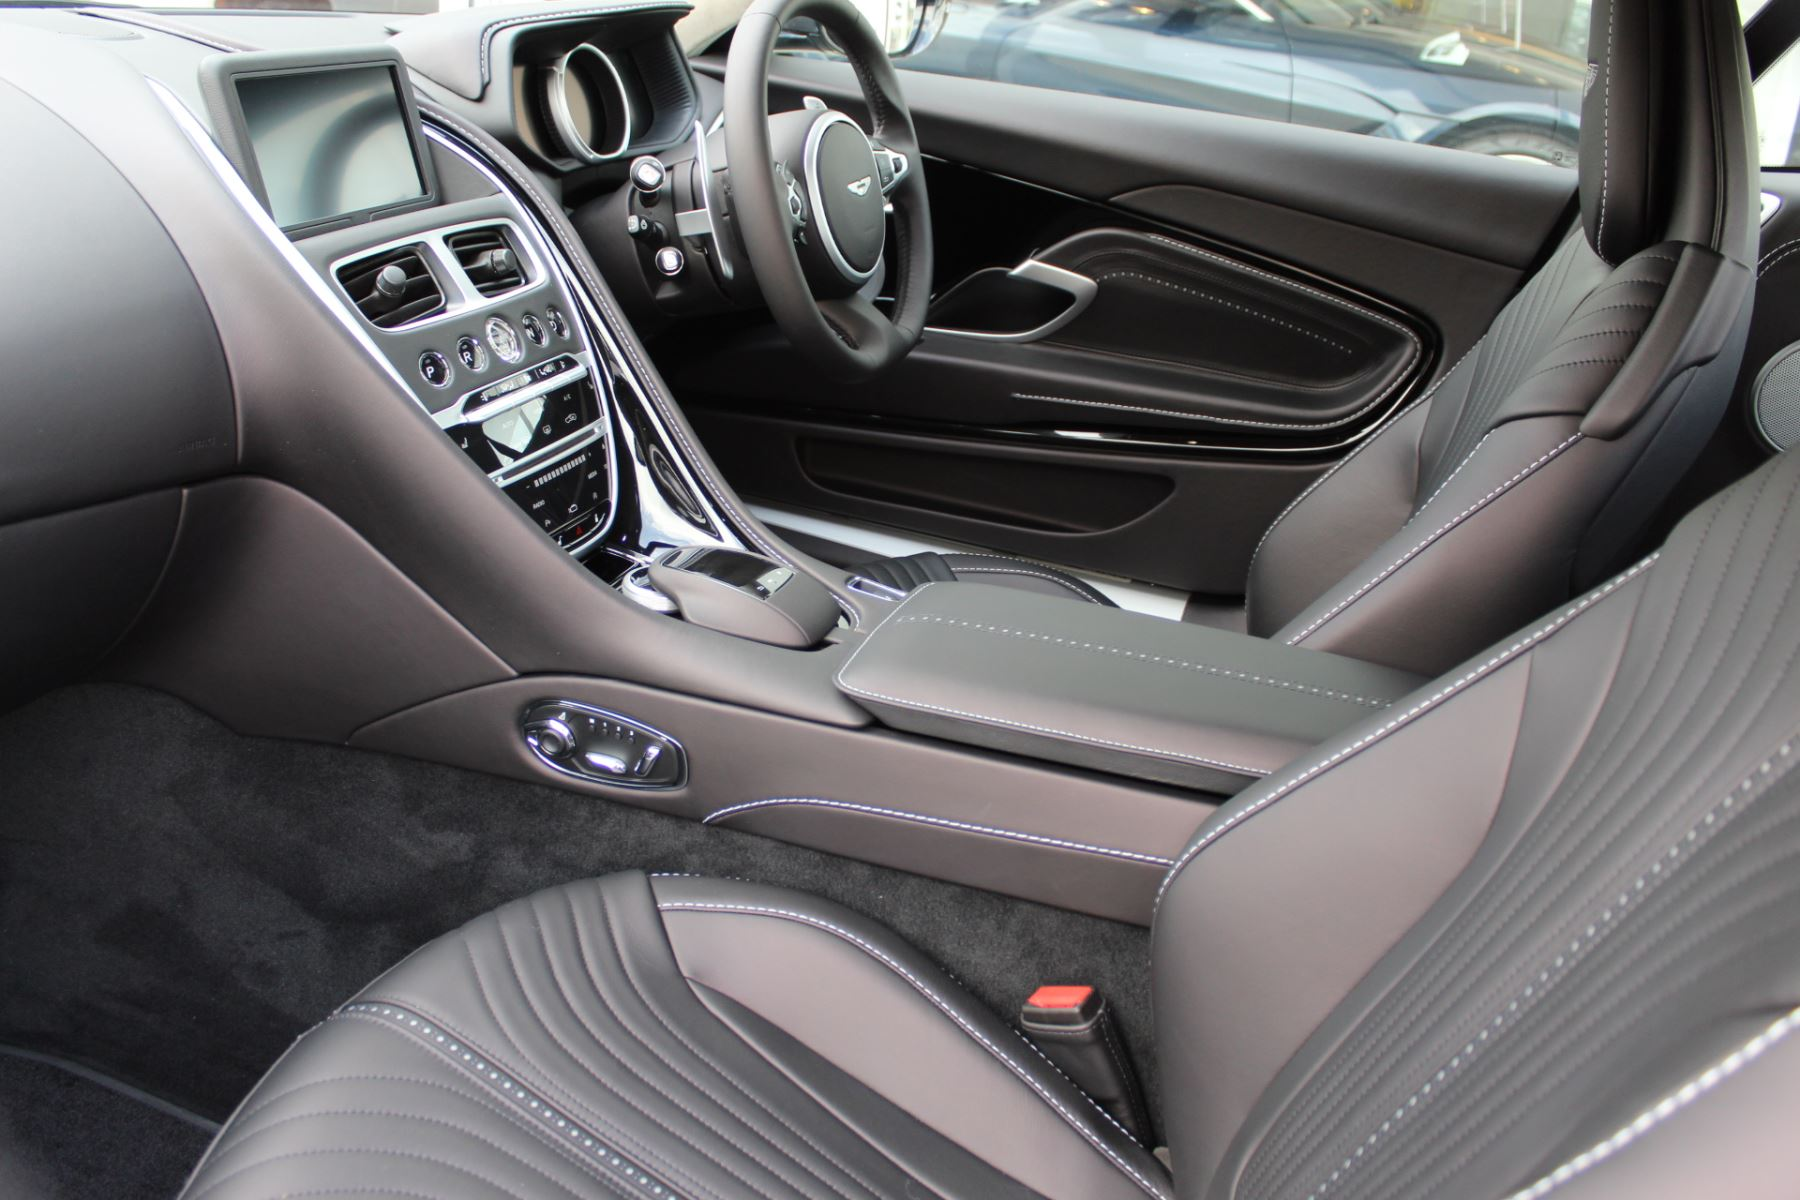 Aston Martin DB11 V8 Touchtronic image 9